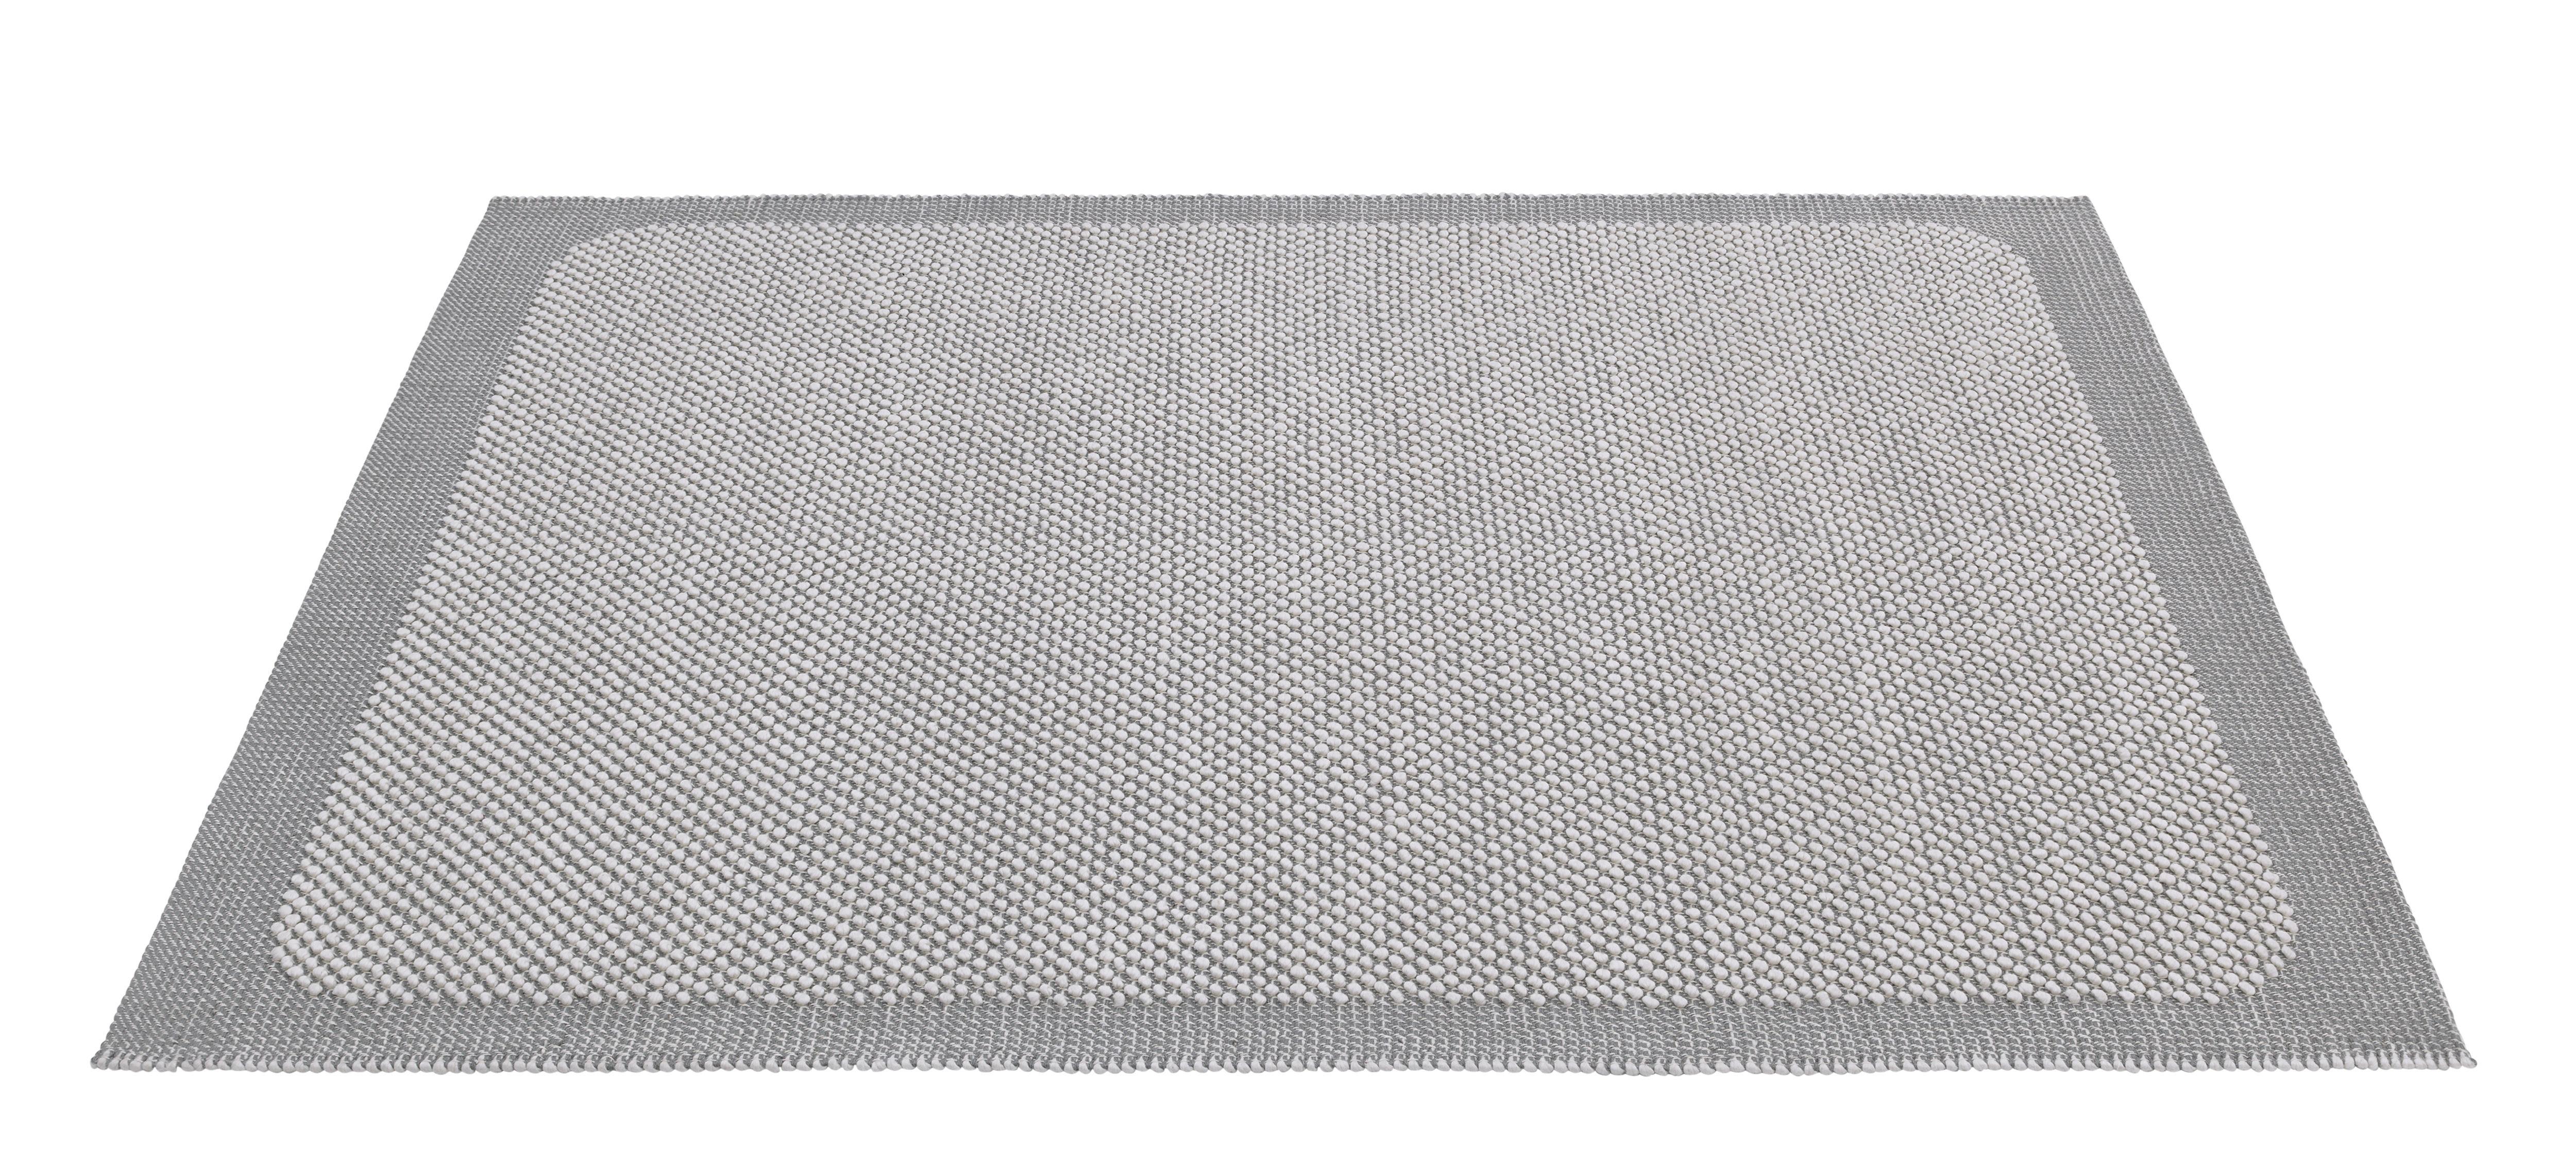 Dekoration - Teppiche - Pebble Teppich / handgewebt - 200 x 300 cm - Muuto - Hellgrau - Fibres de jute, Wolle